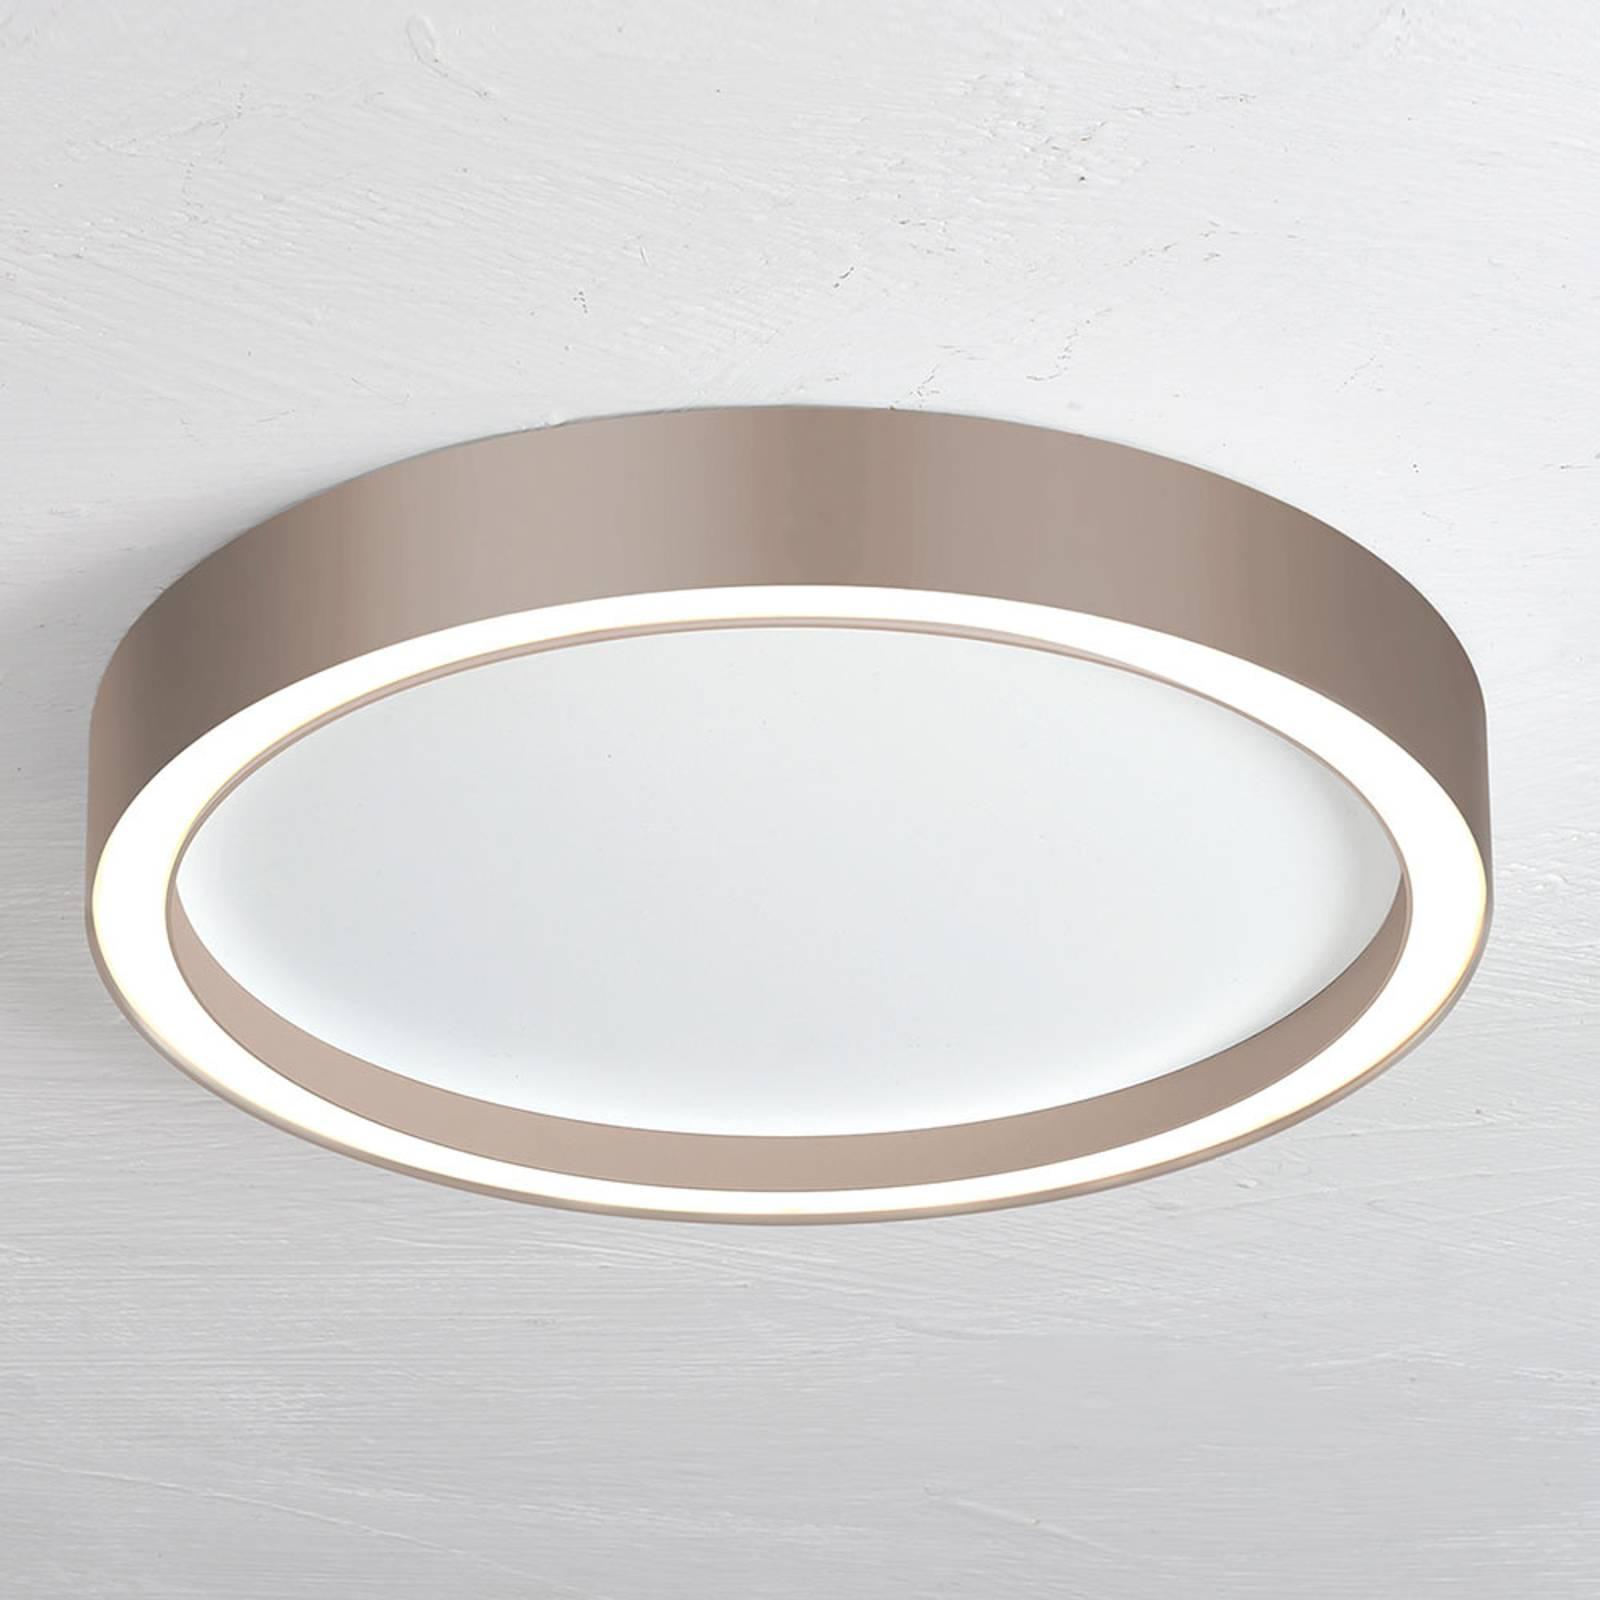 Bopp Aura LED plafondlamp Ø 55cm wit/taupe